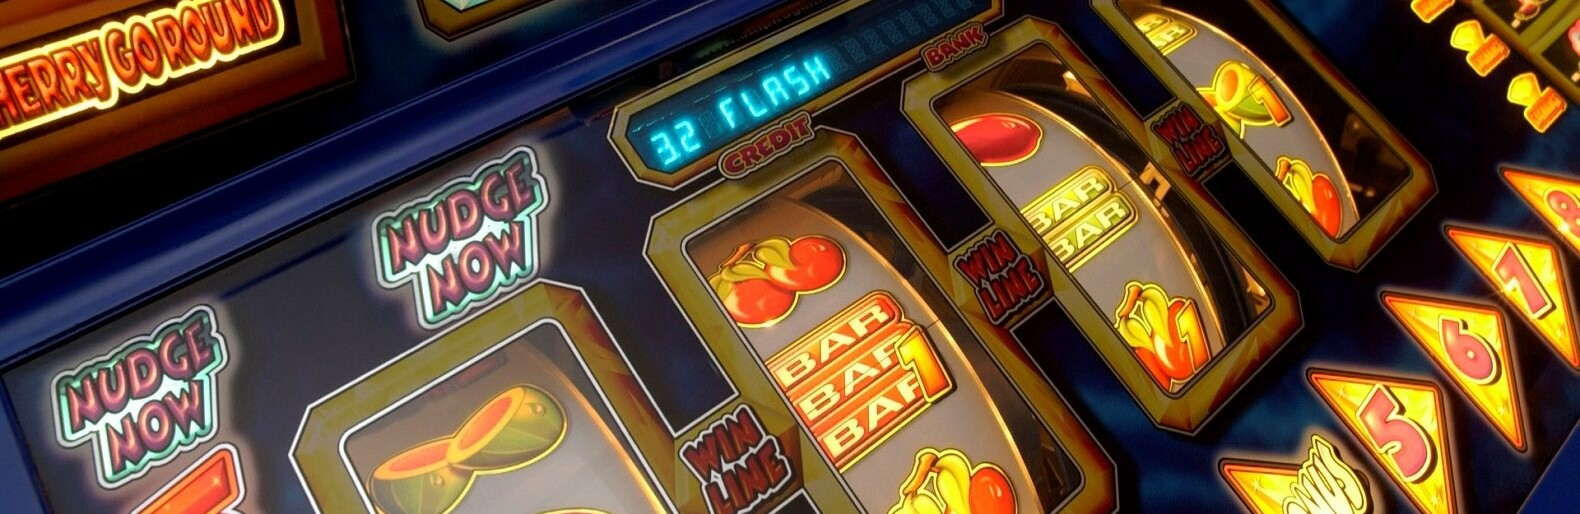 At the copa описание игрового автомата